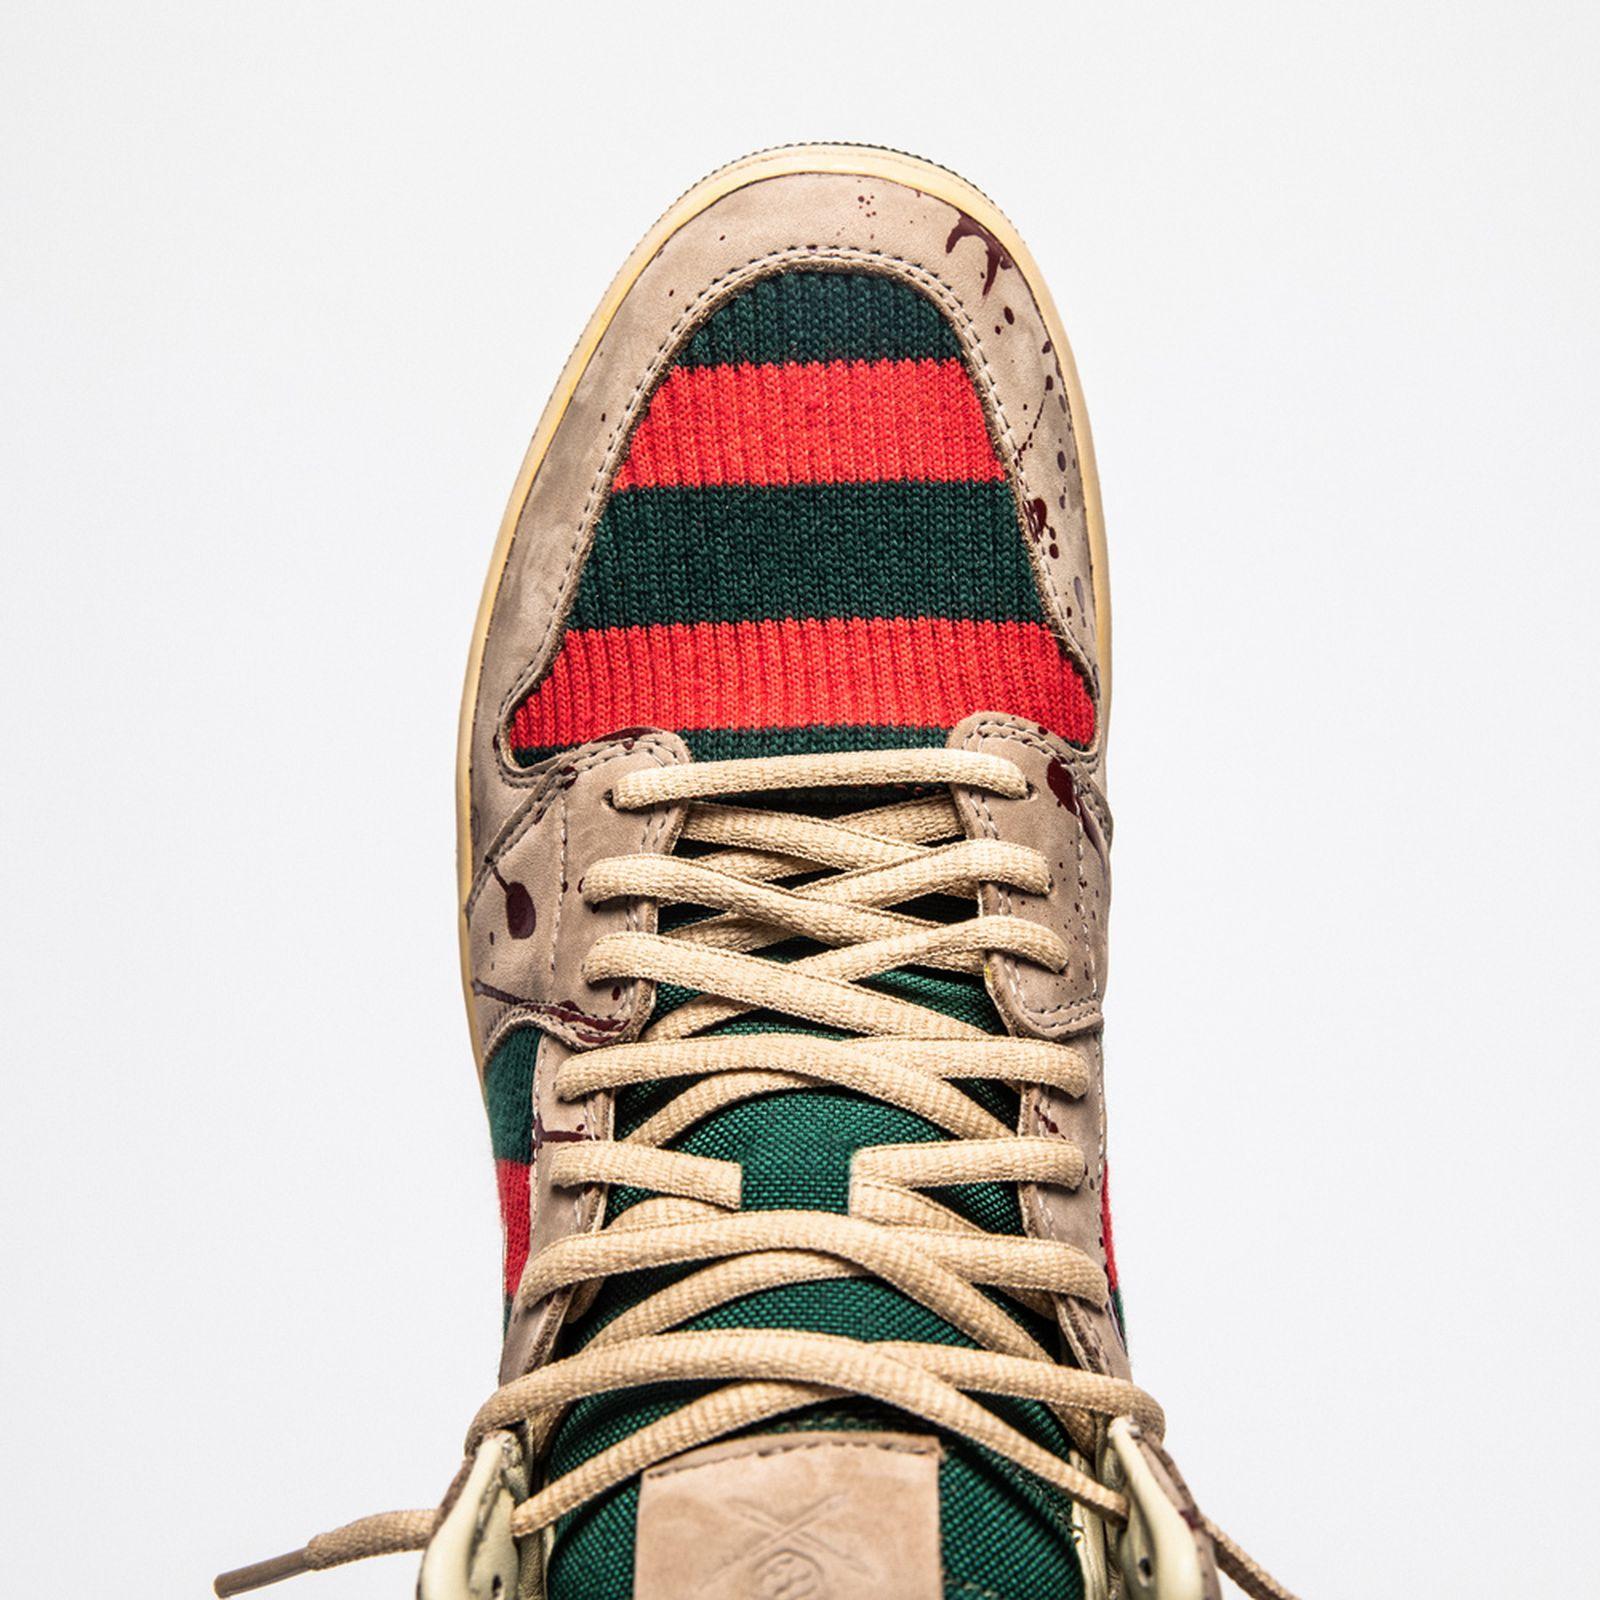 shoe-surgeon-nike-air-jordan-1-freddy-krueger-release-date-price-03